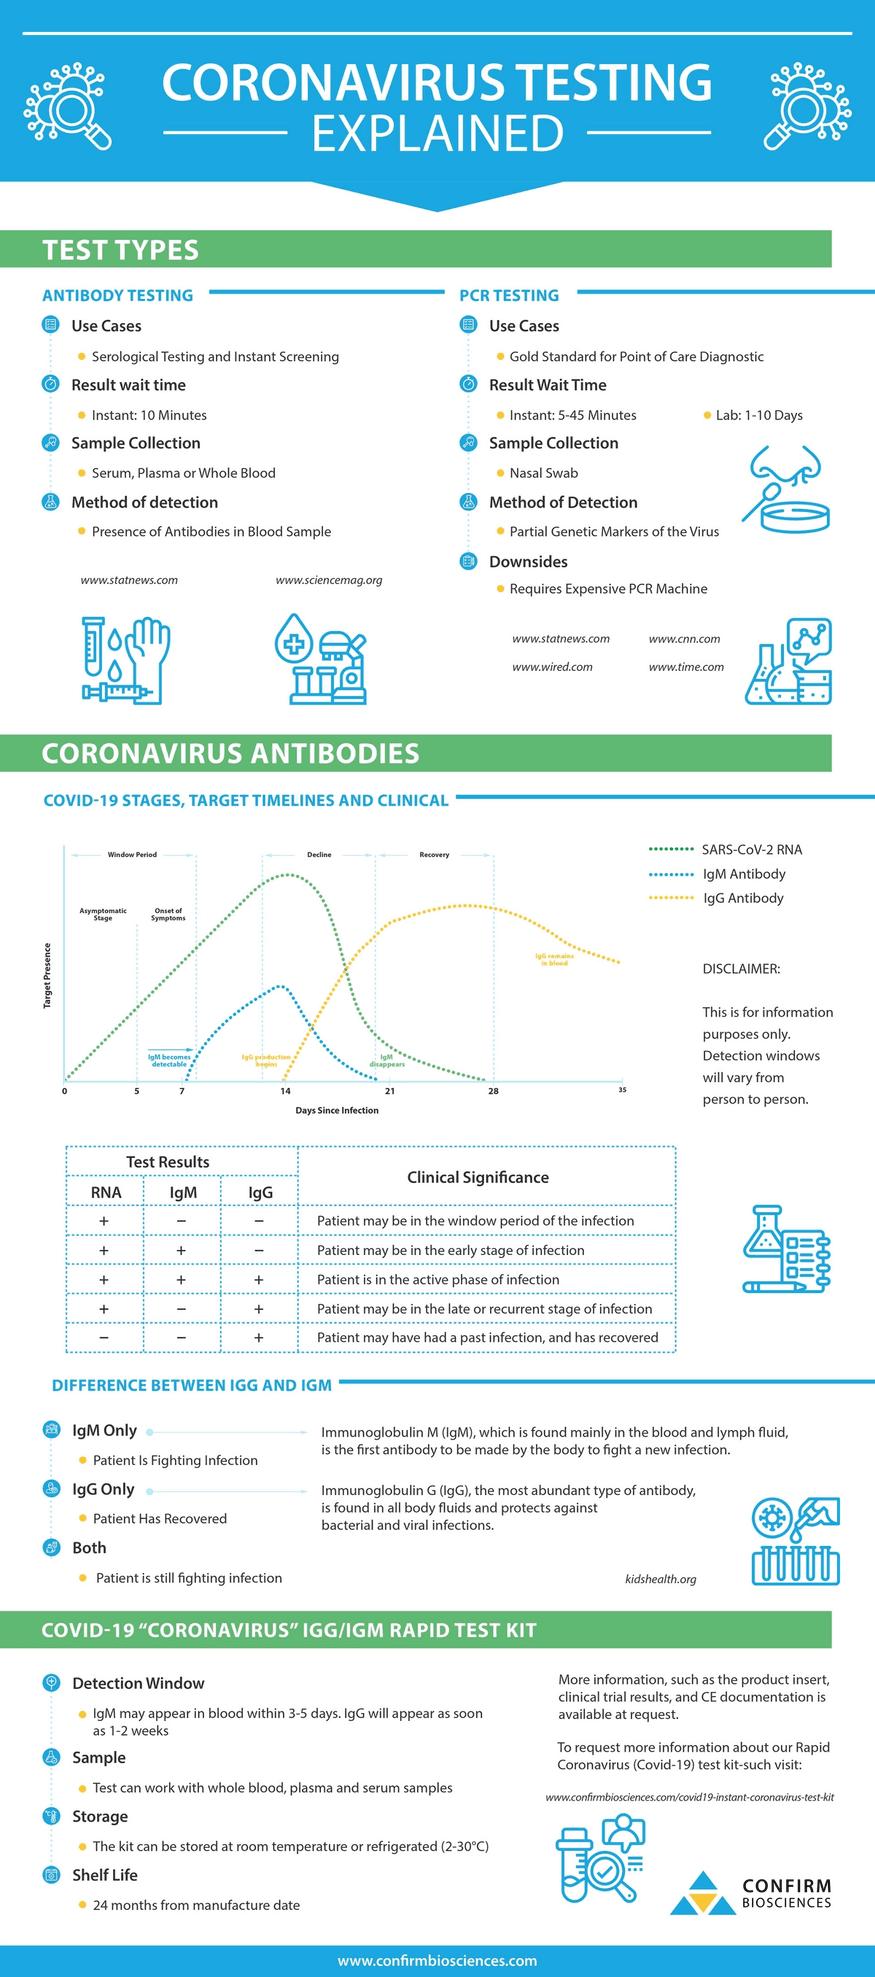 Coronavirus Testing Explained Infographic